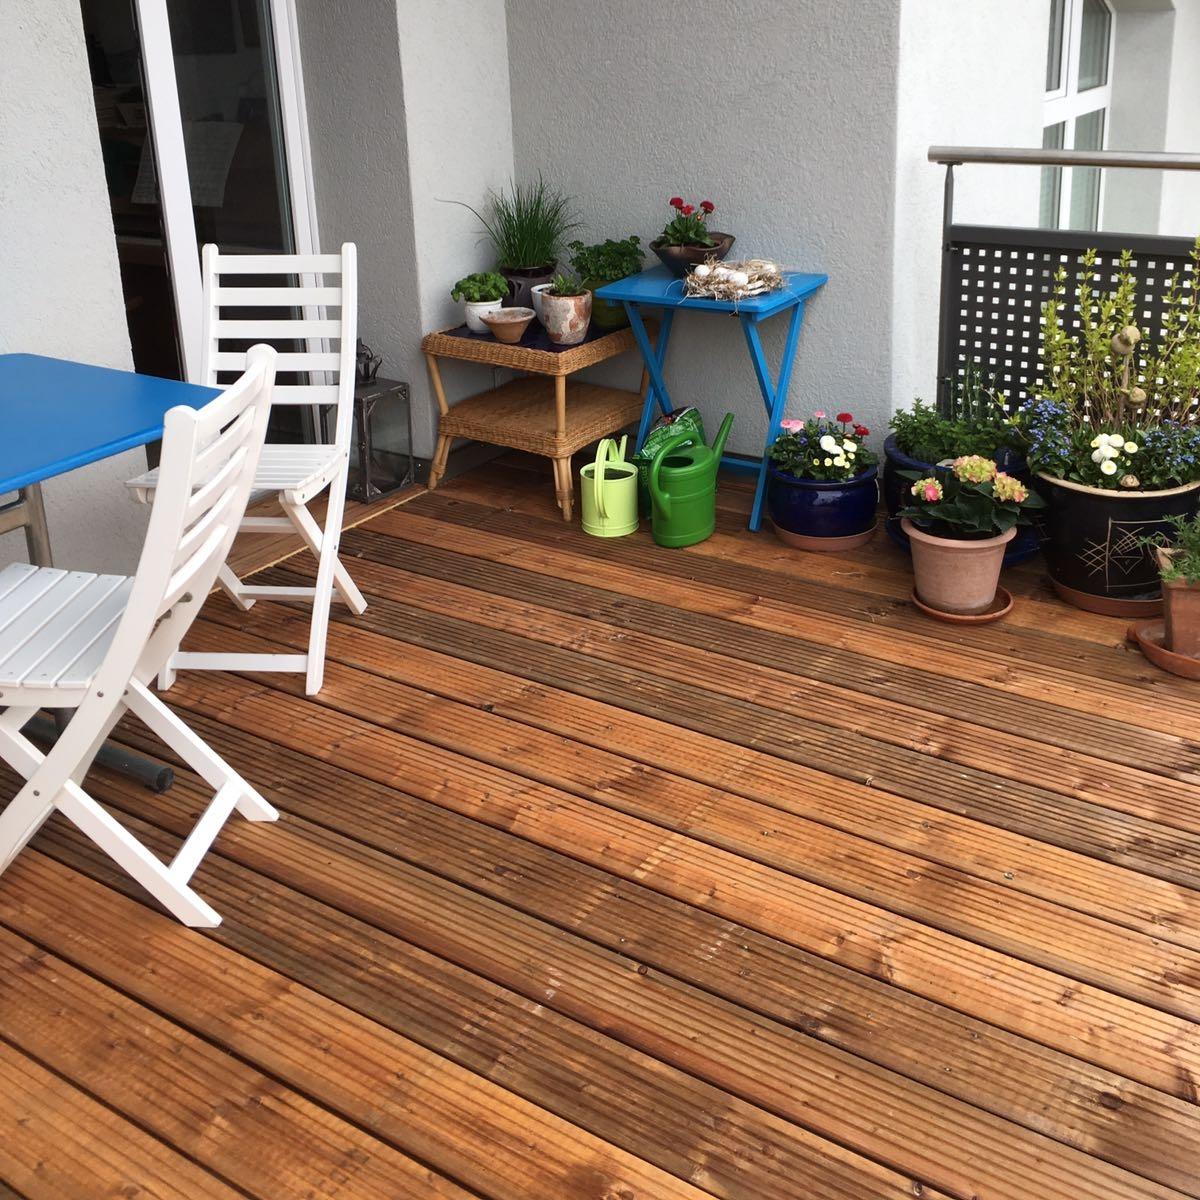 Balkonboden in Föhre druckimprägniert